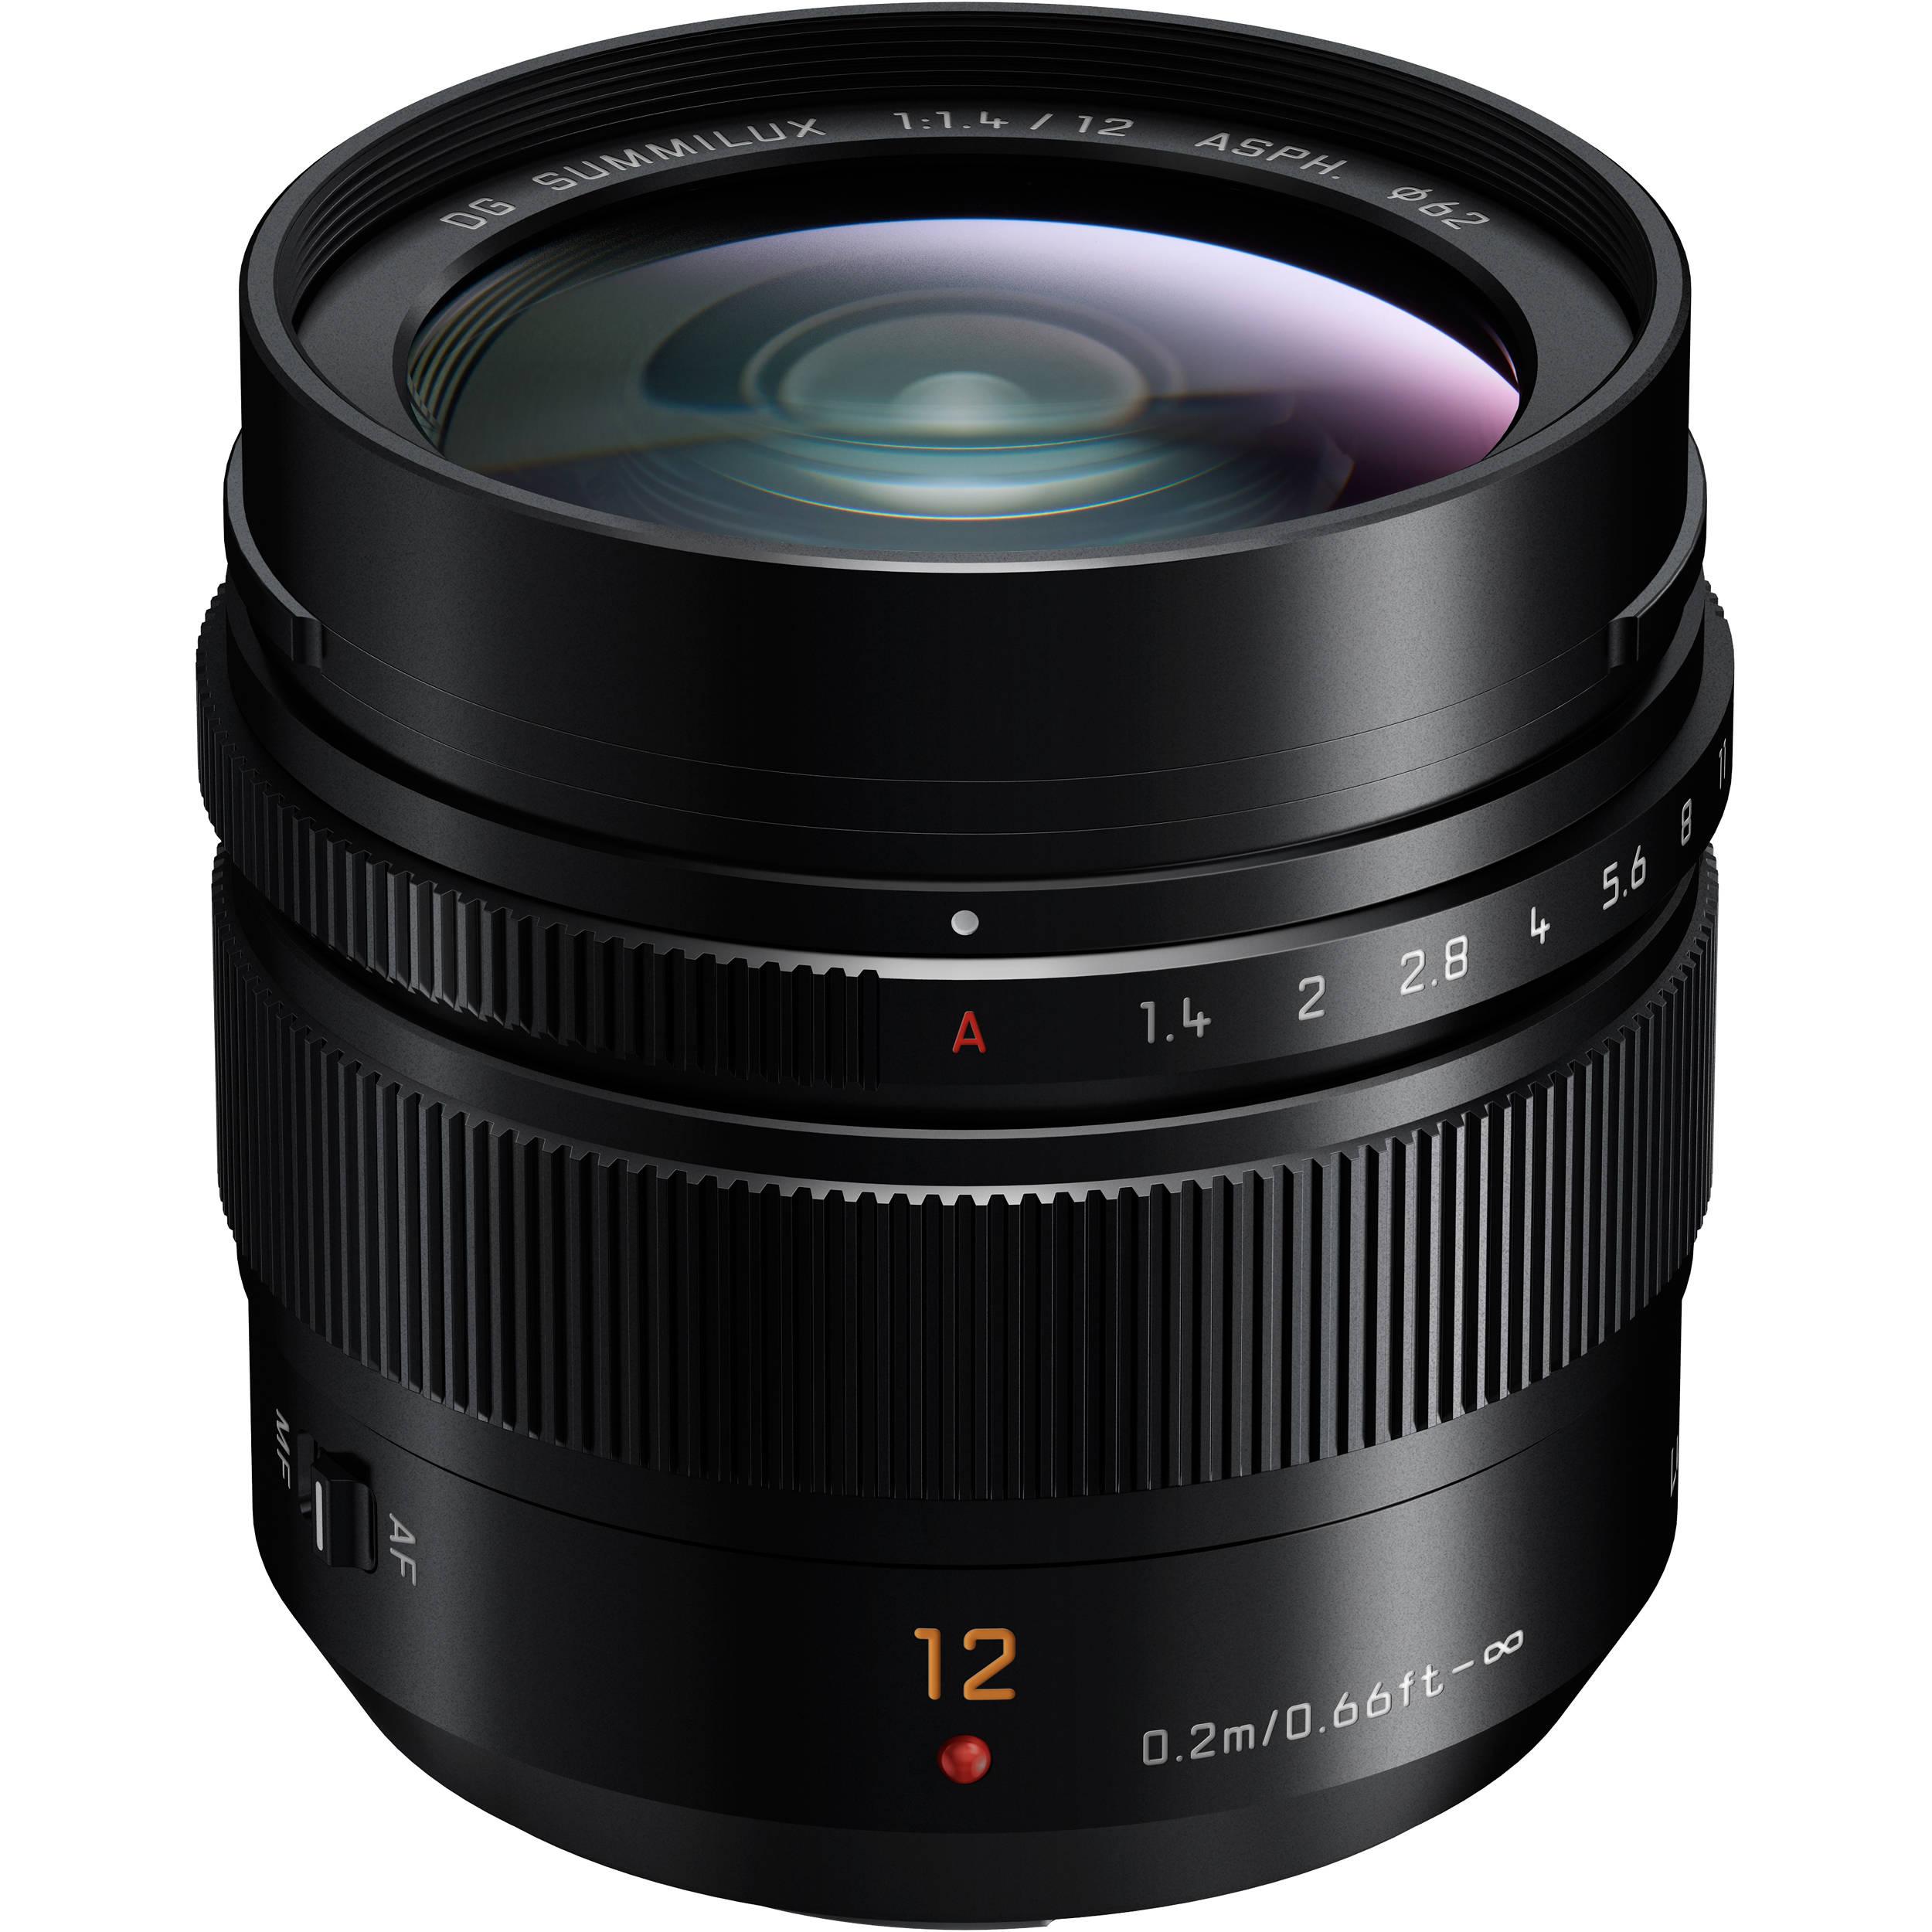 Panasonic Leica 12mm f/1,4 ASPH